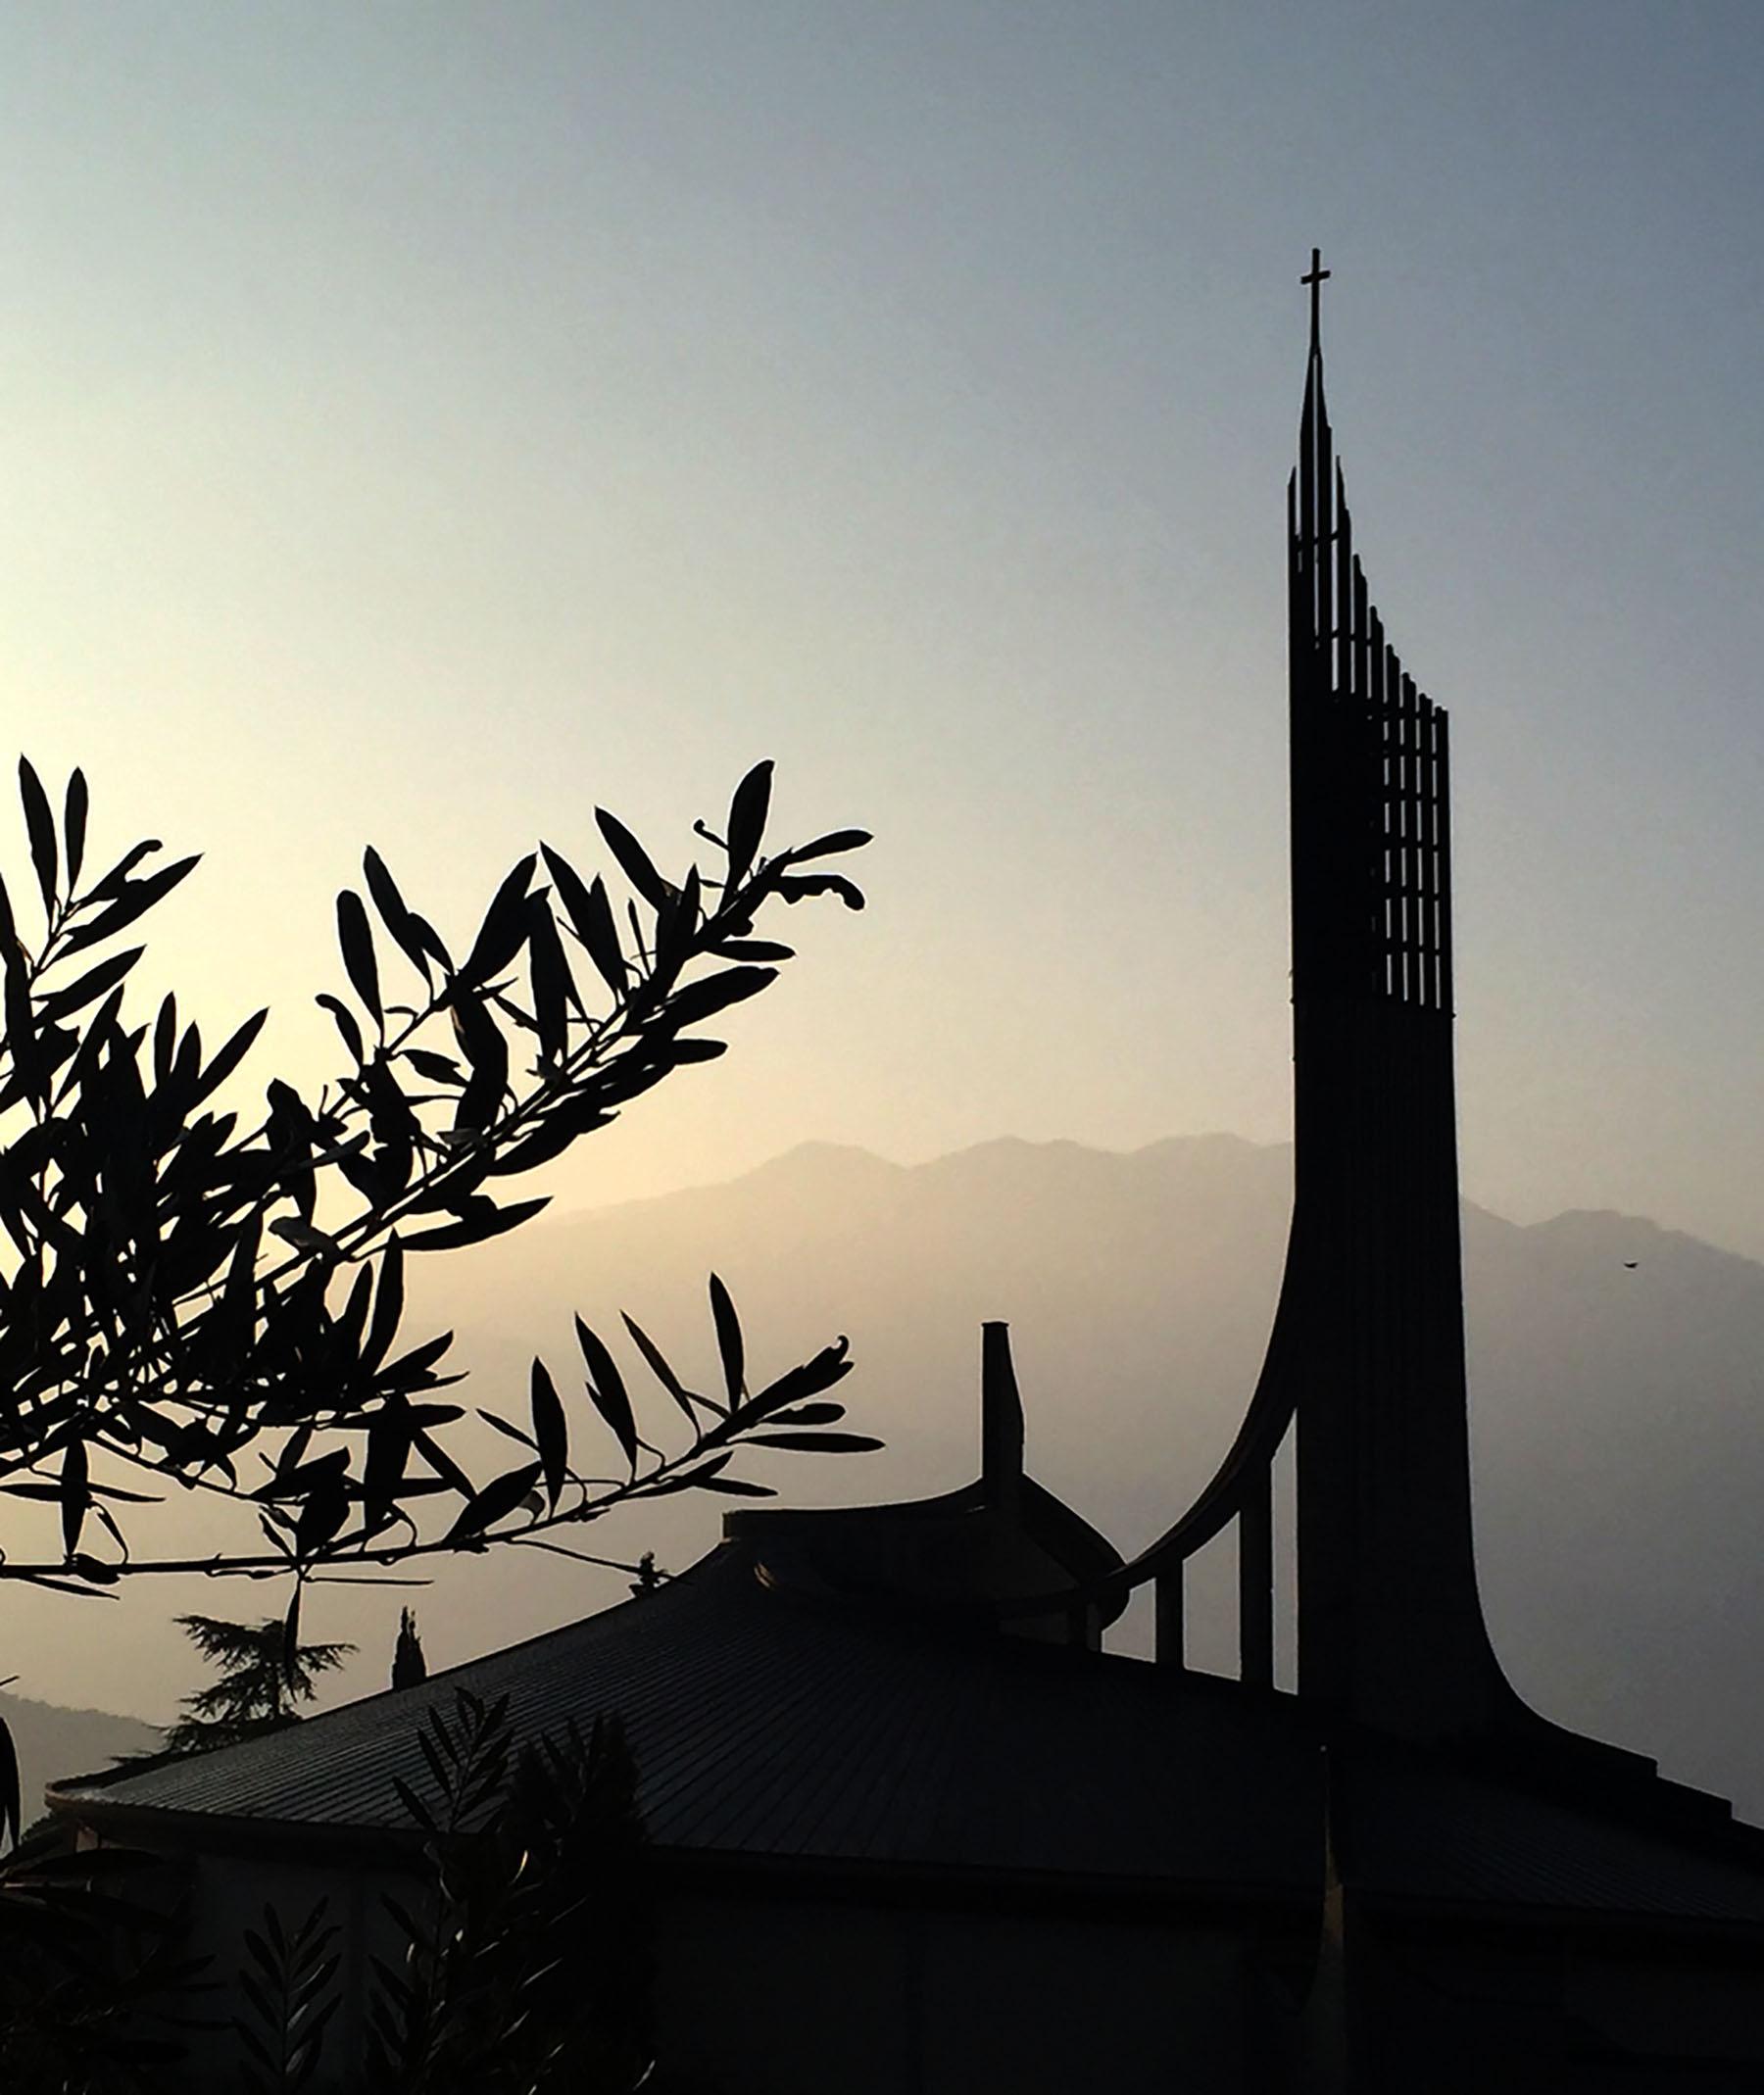 San Giovanni in Riva del Garda at sunset - awards venue